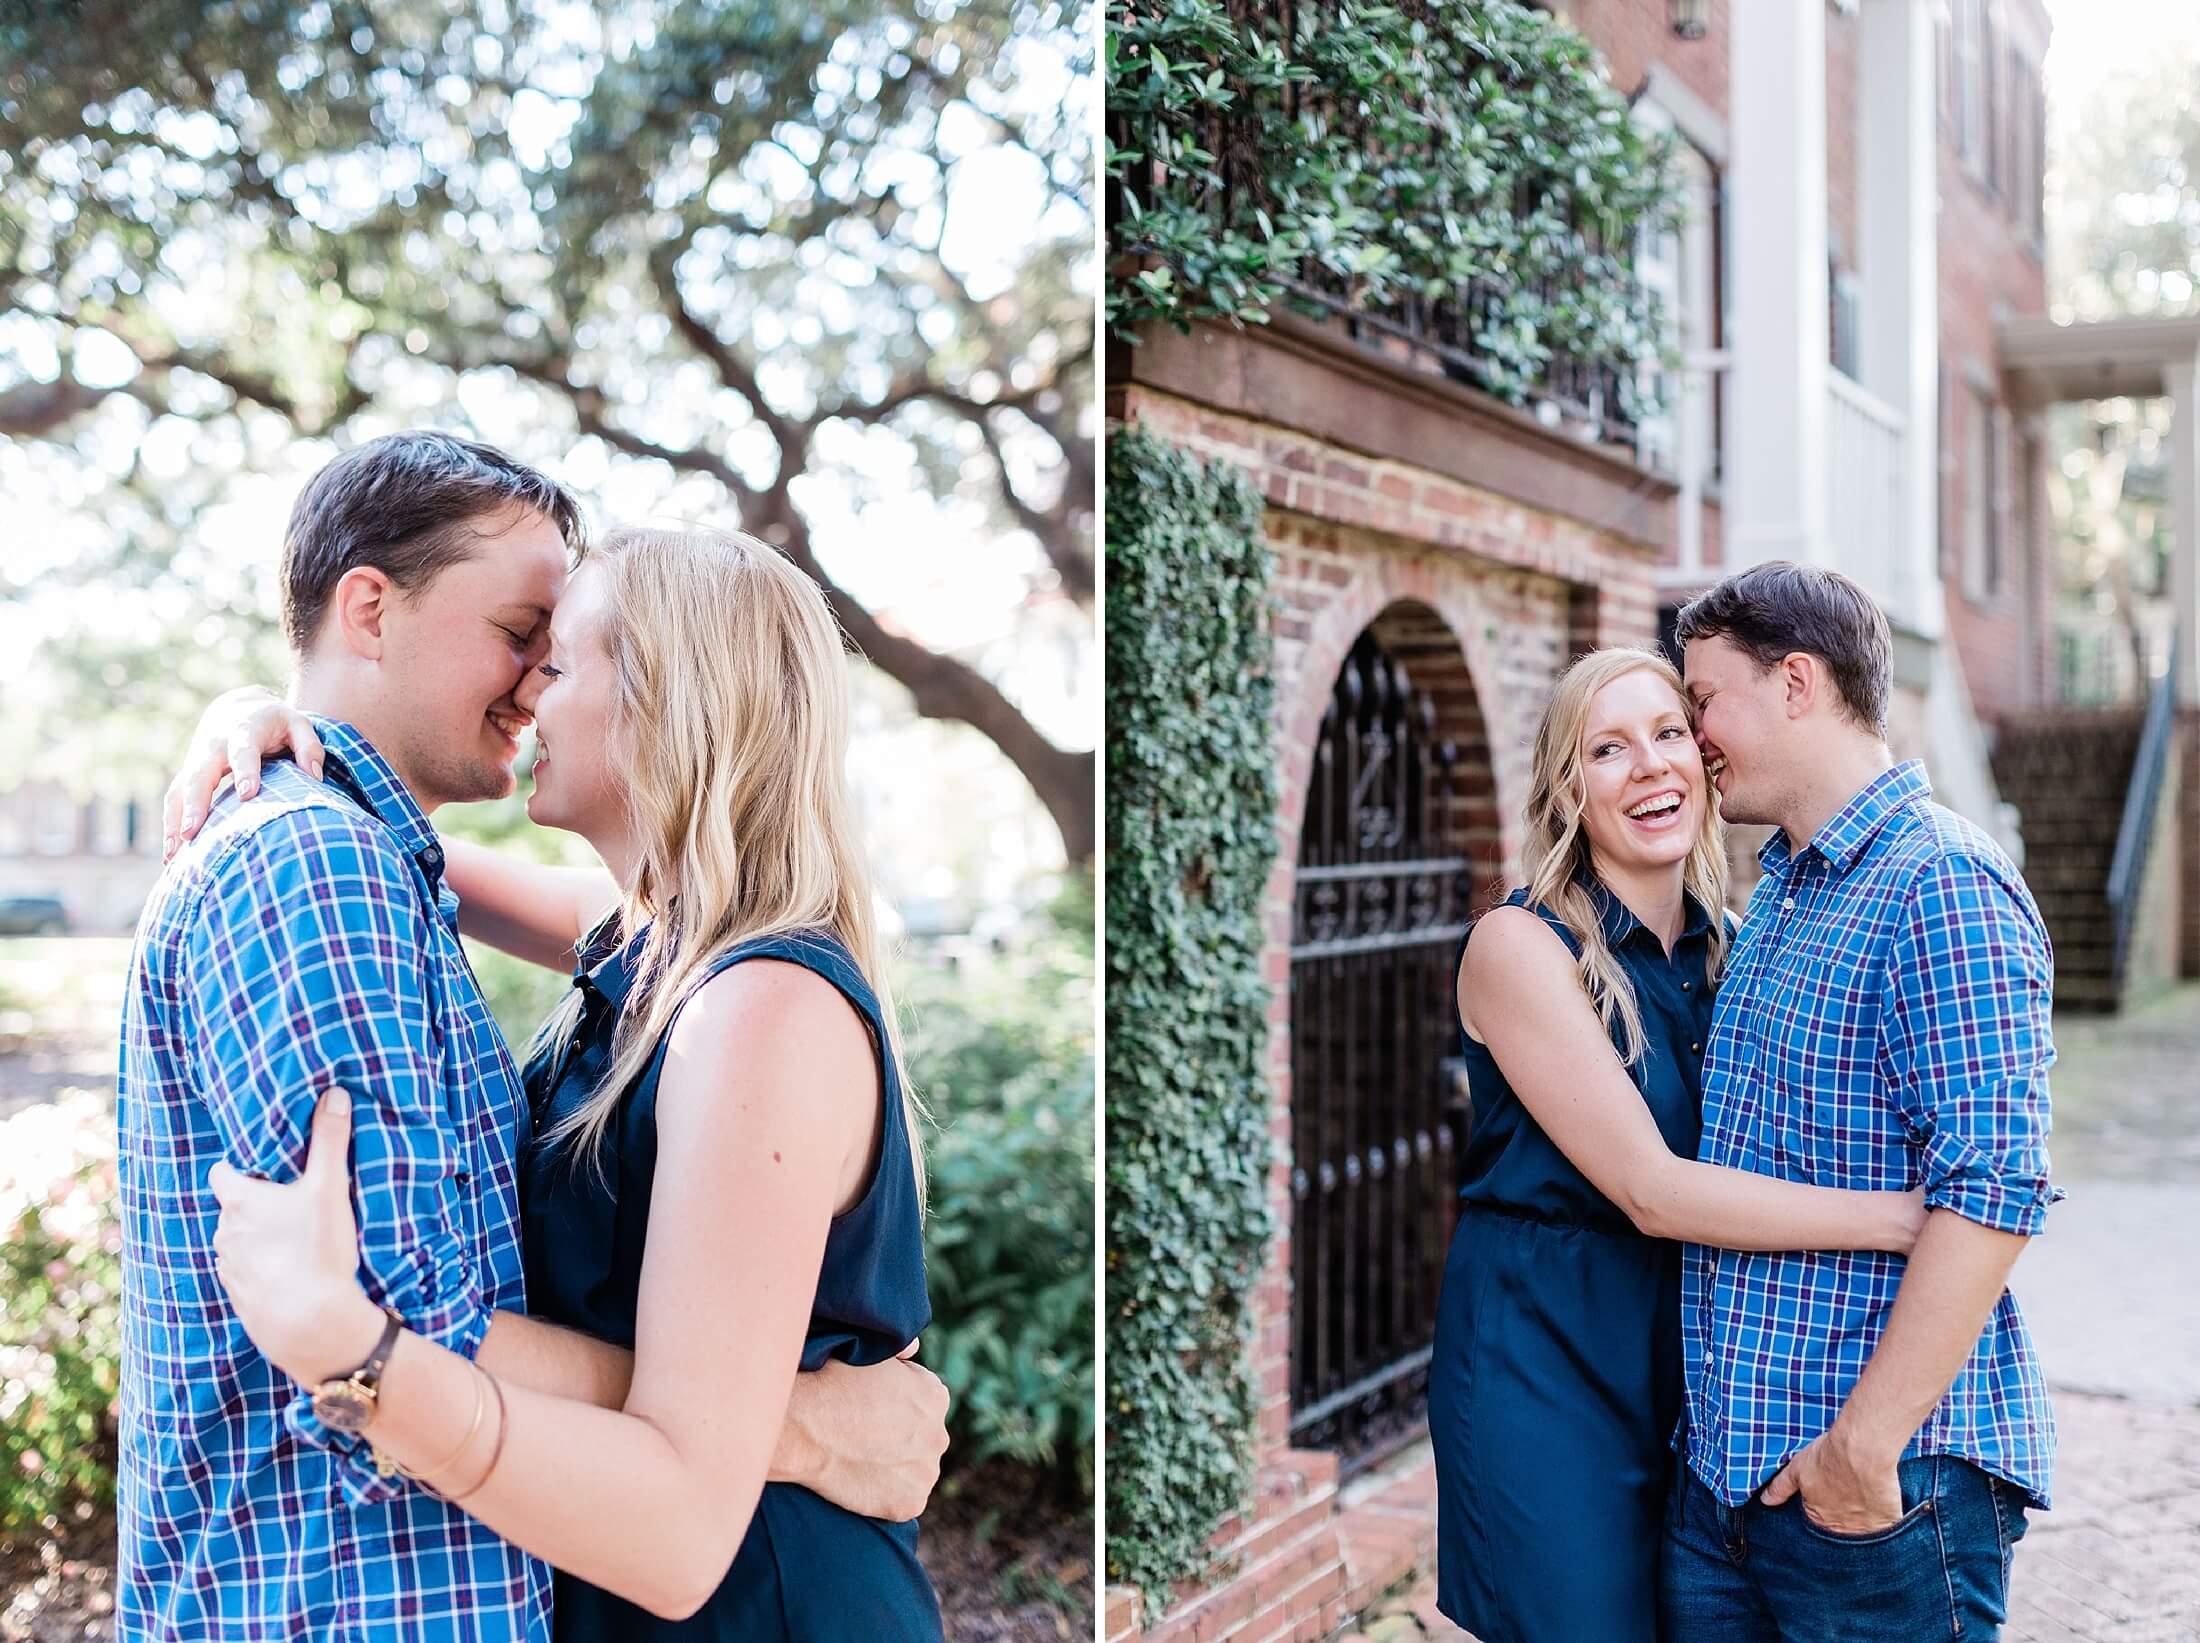 Apt-b-photography-savannah-engagement-photographer-savannah-wedding-hilton-head-elopement-savannah-wedding-photographer-1.jpg